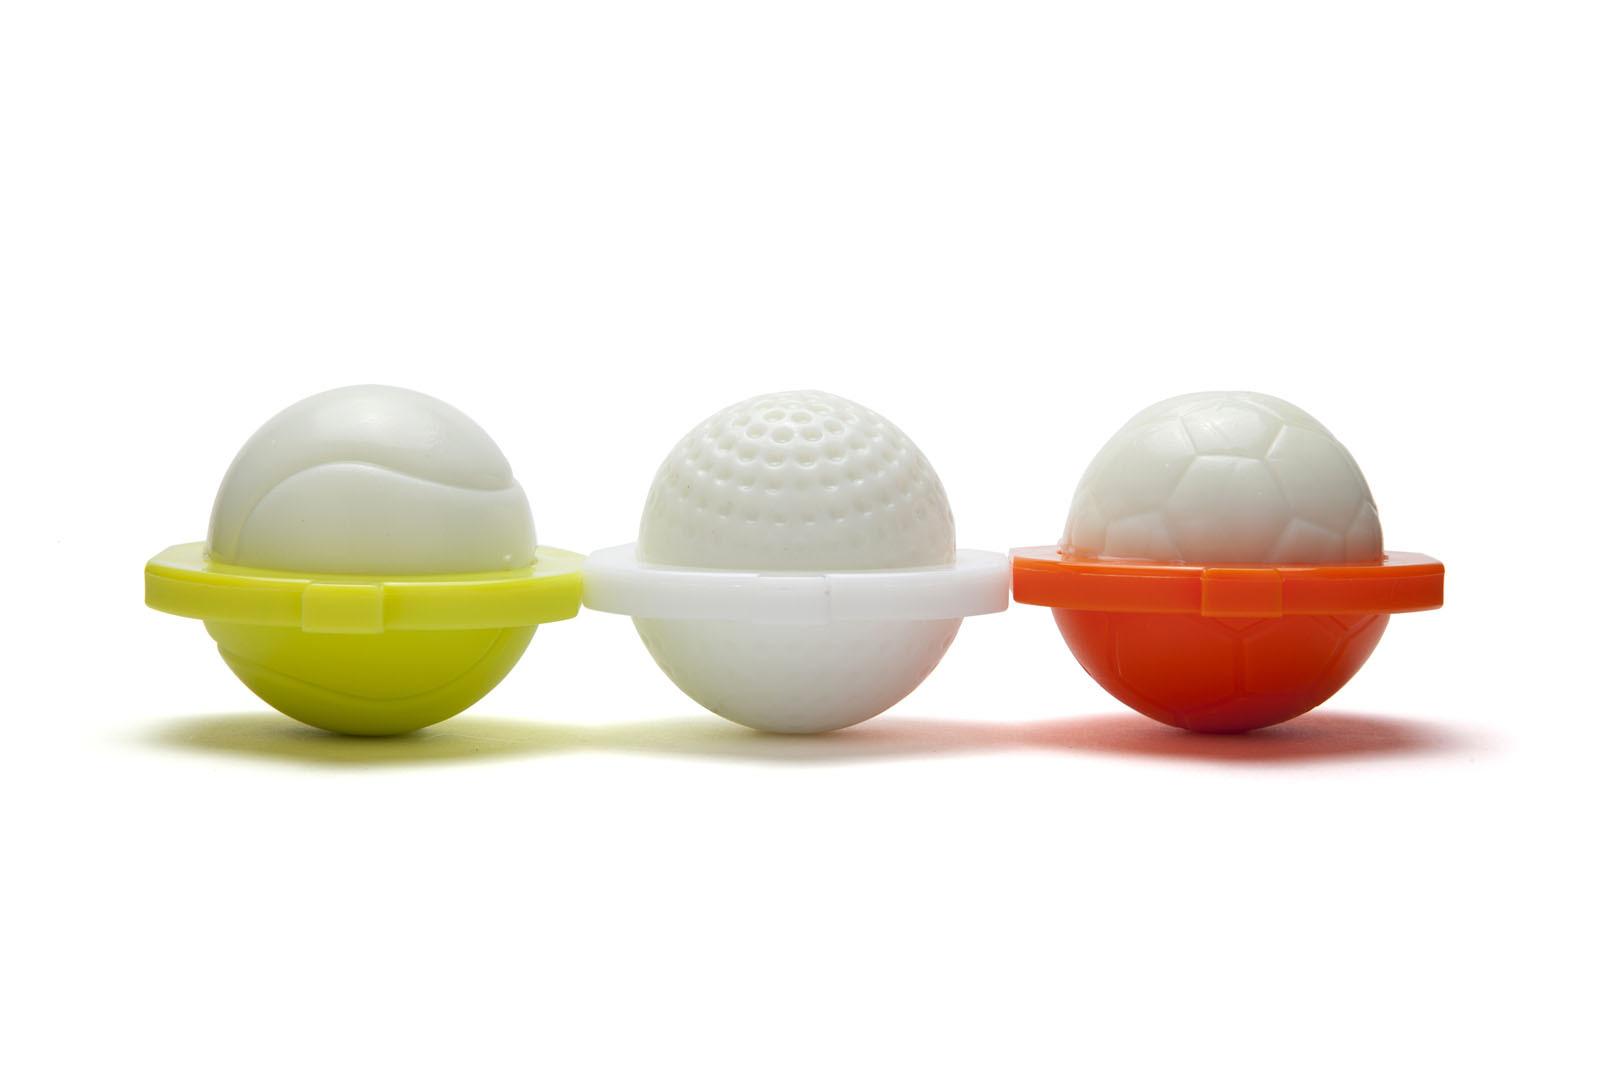 Kids Funky Food Gifts Egg Shapers Design Breakfast Chef  FootBall Sports Huevo